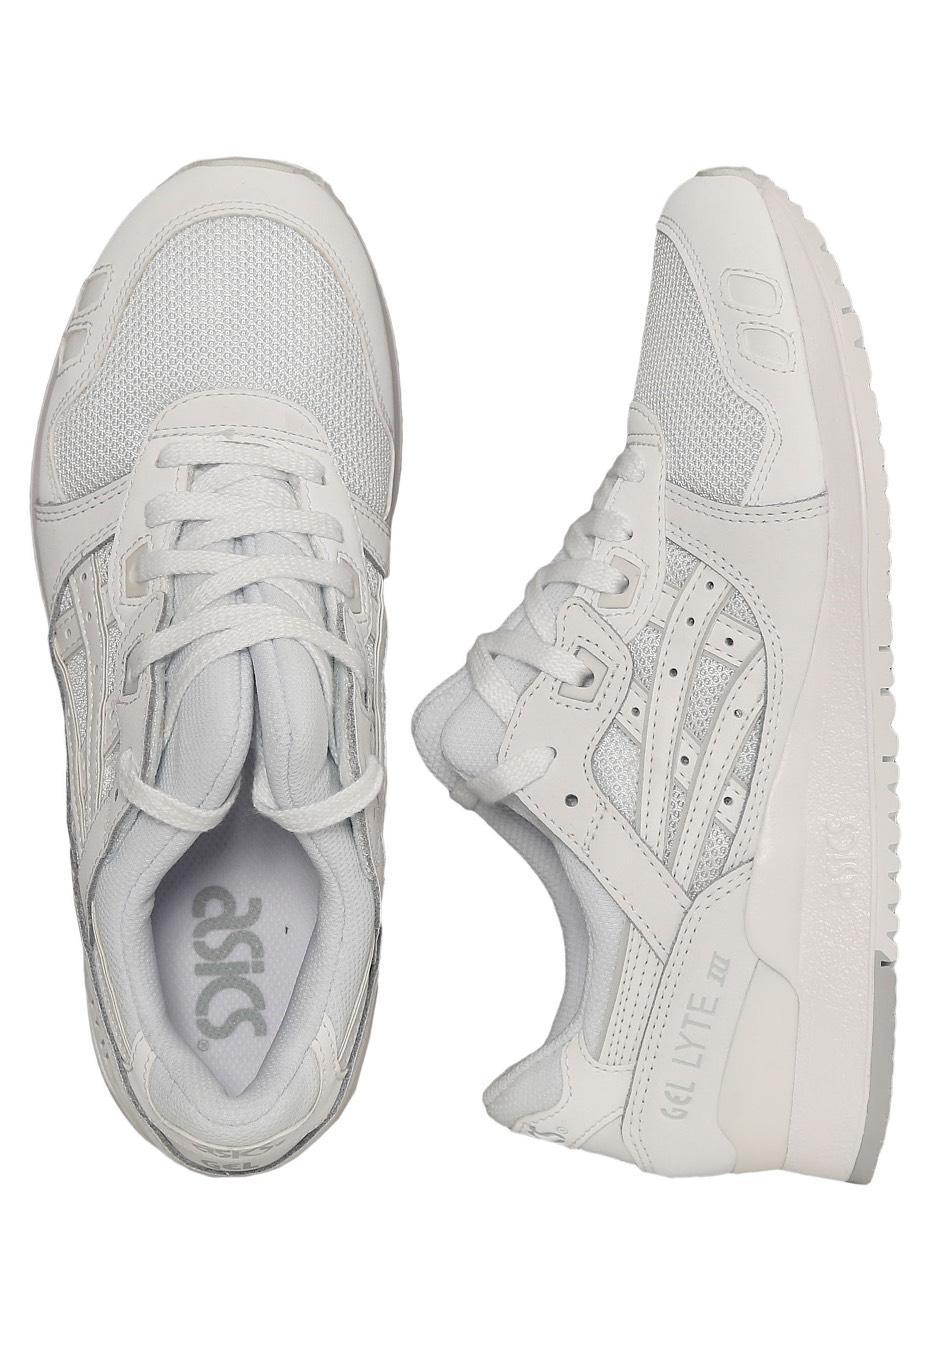 37f10fc7f5 Asics - Gel-Lyte III White White - Sapatos de Mulher - Impericon.com PT